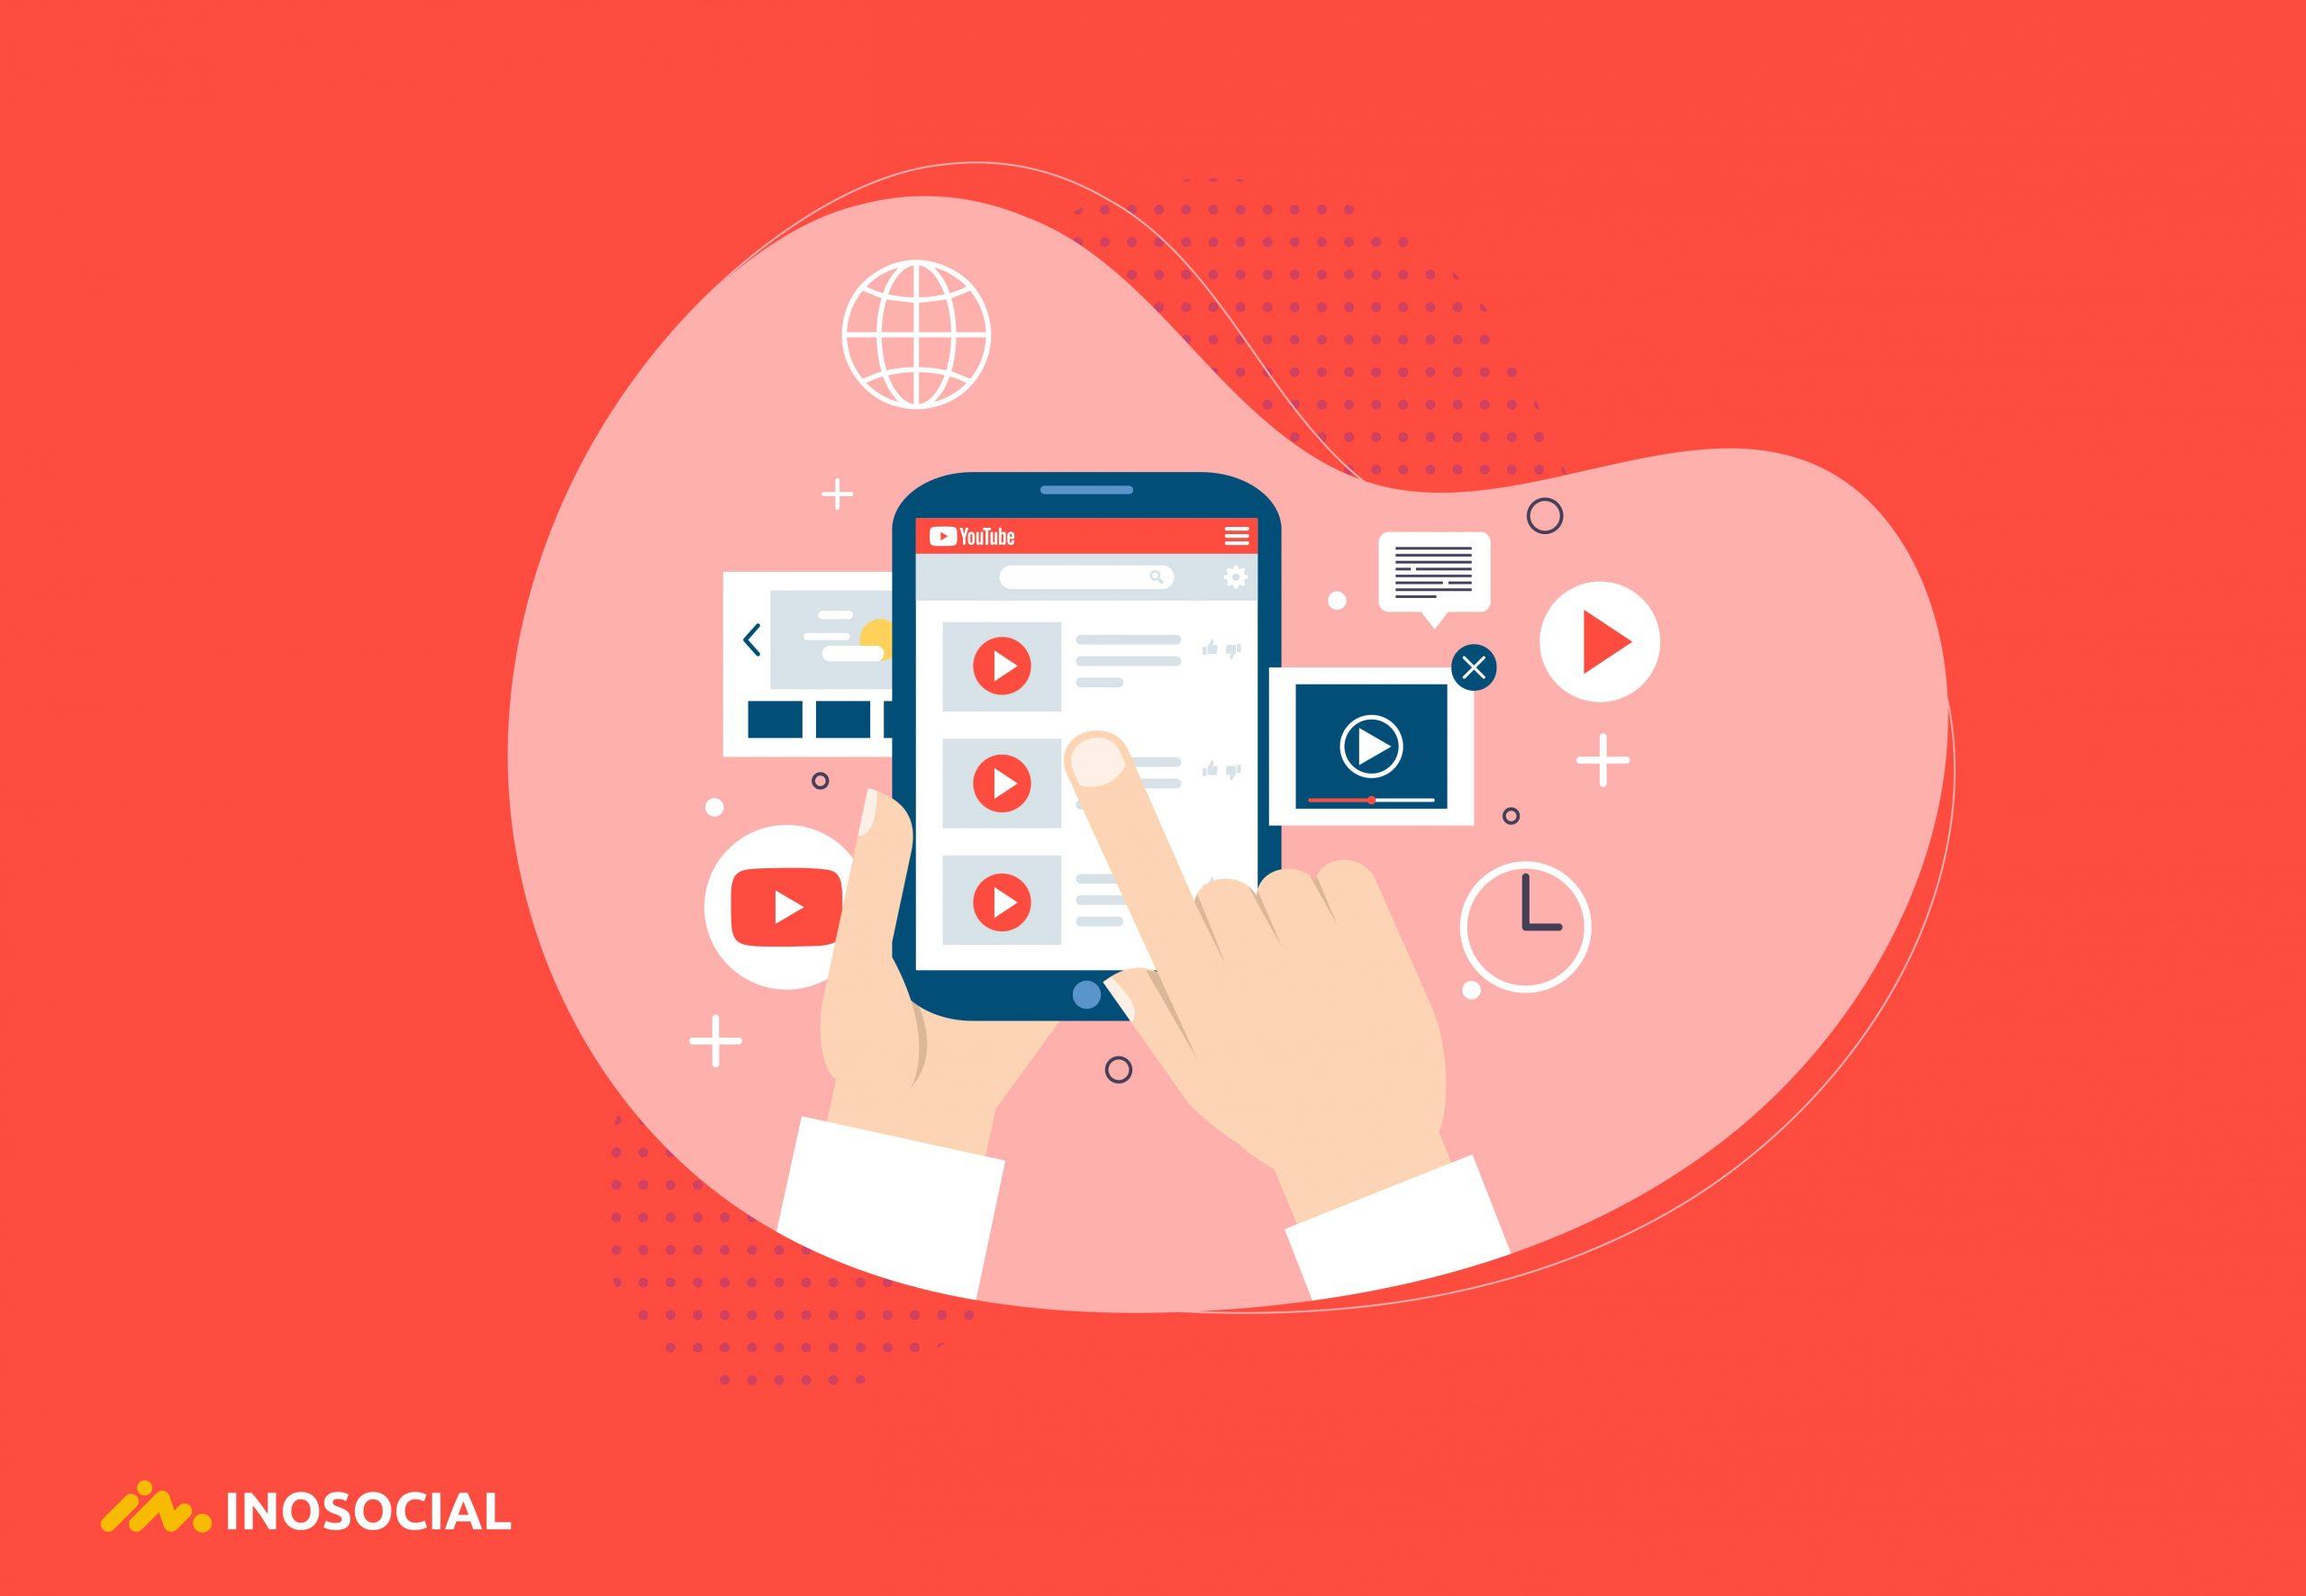 Is YouTube social media?